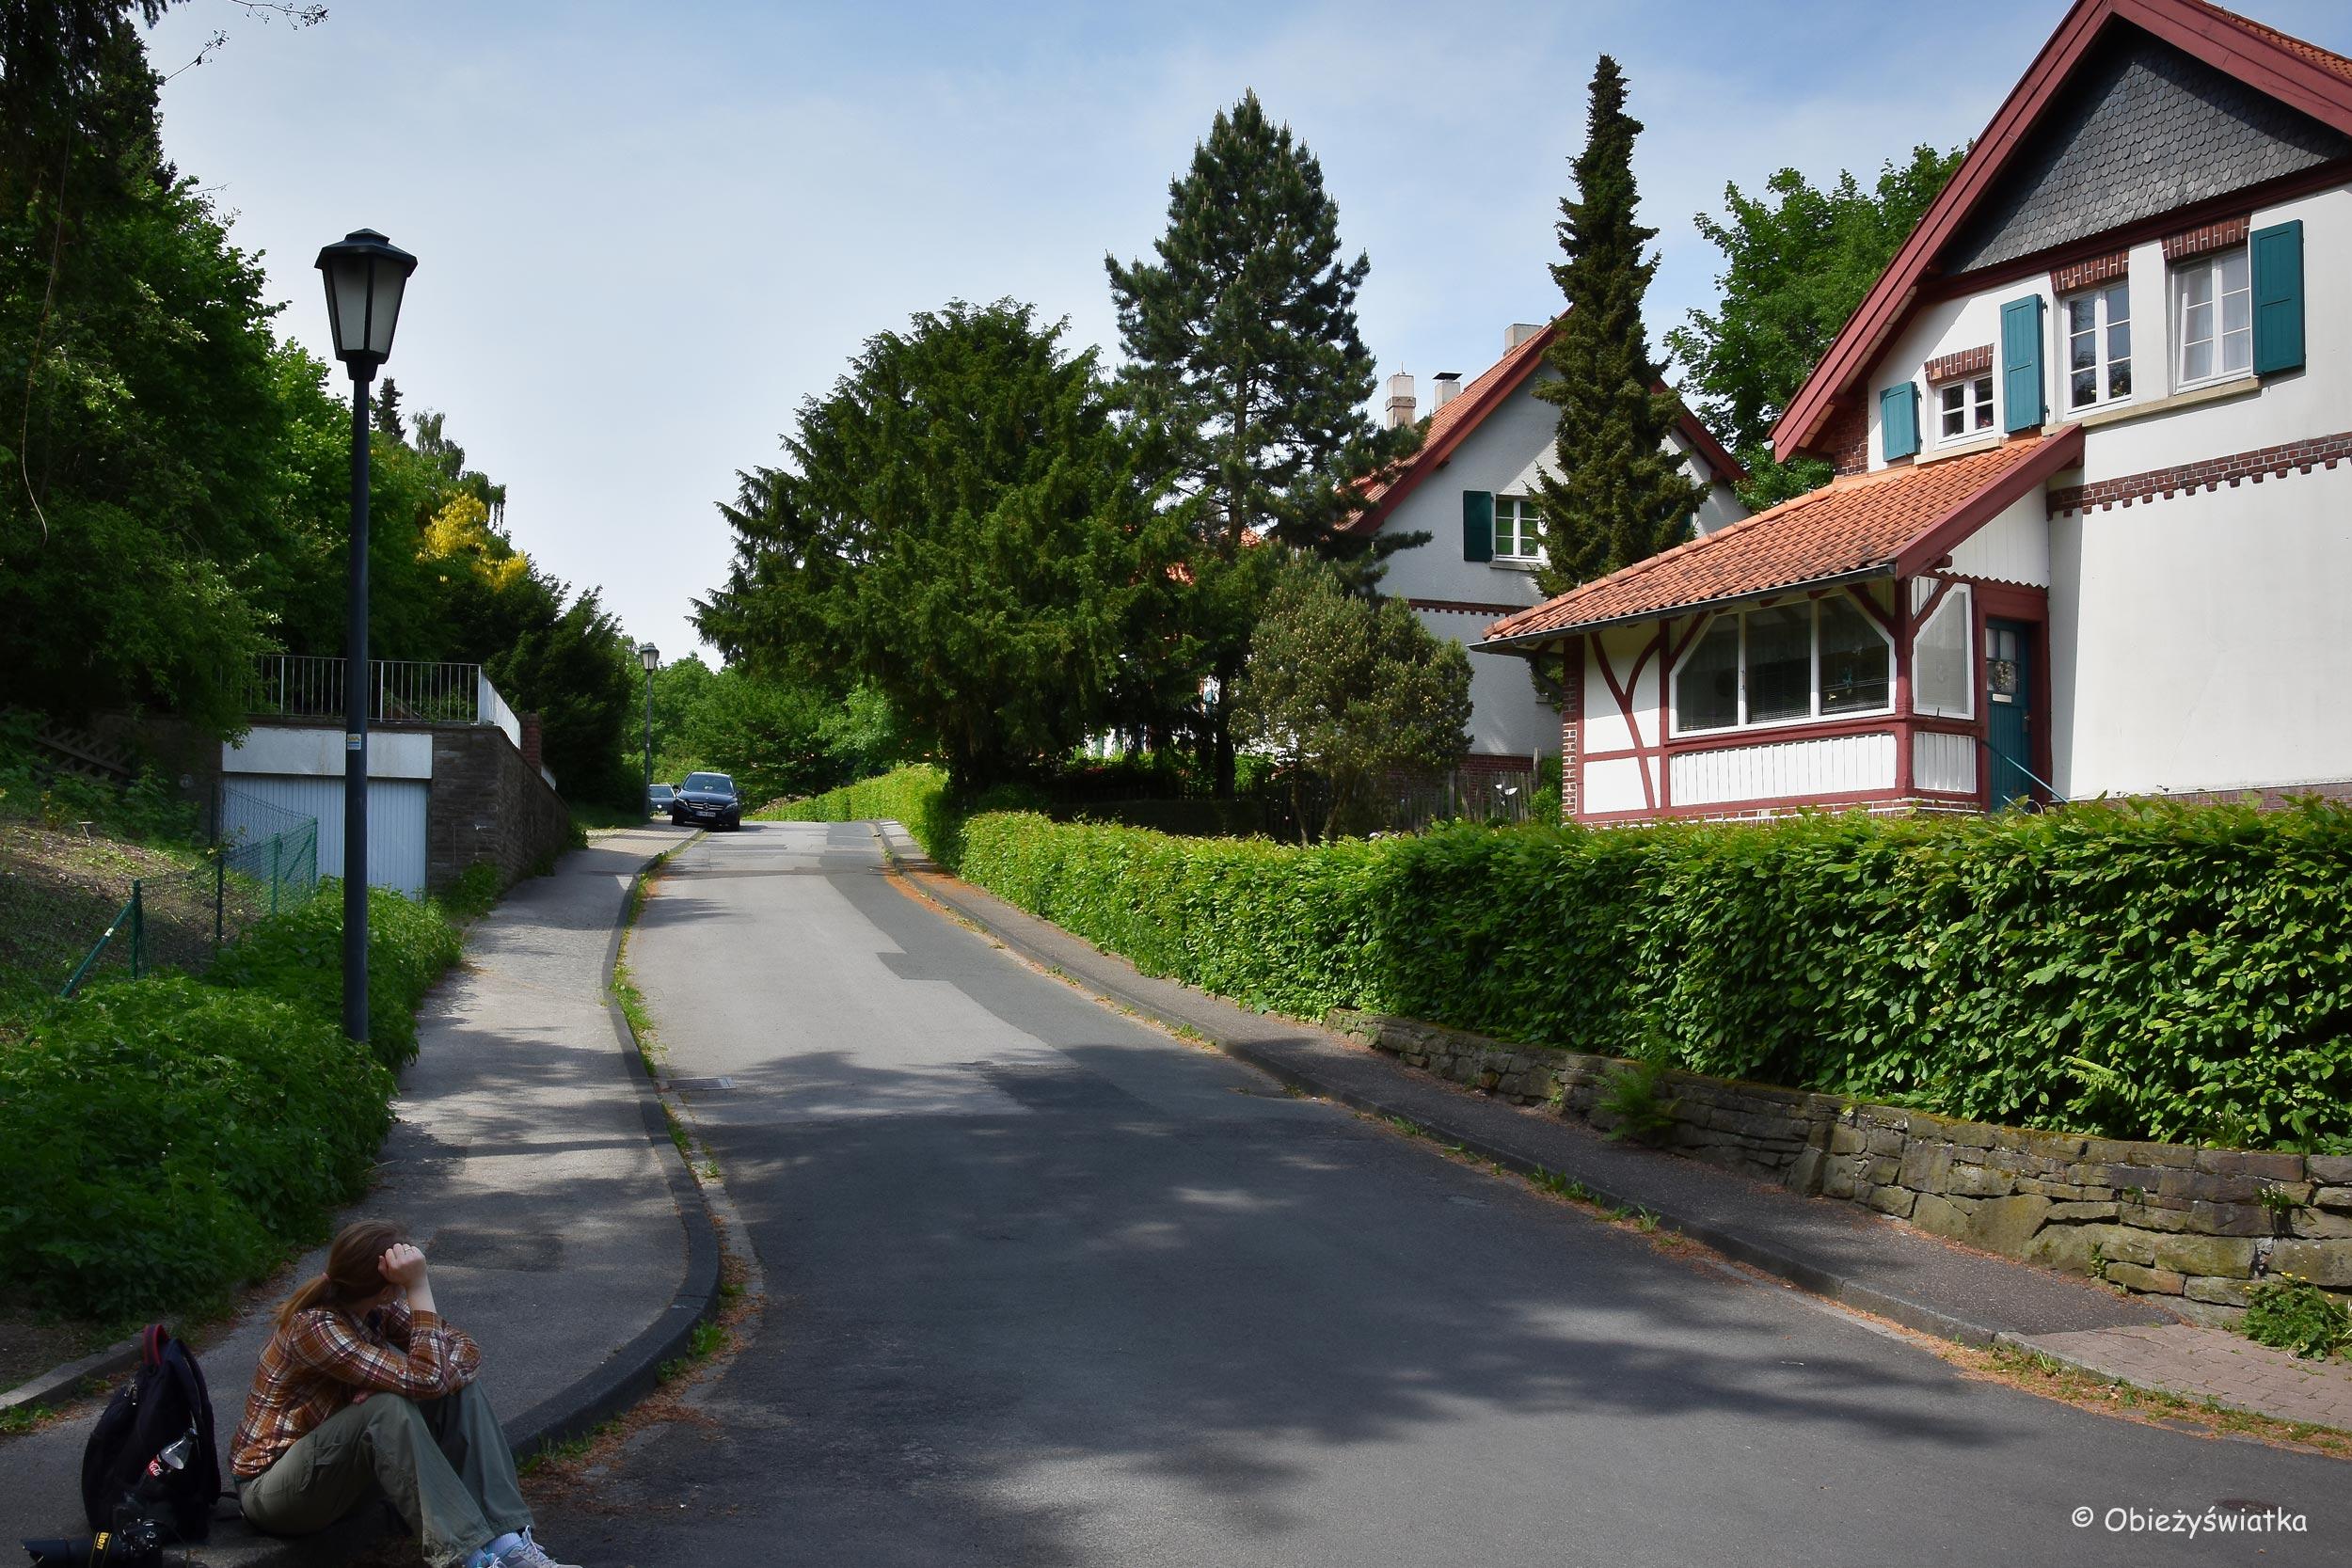 Króciutki odpoczynek, osiedle Brandenbusch, Essen